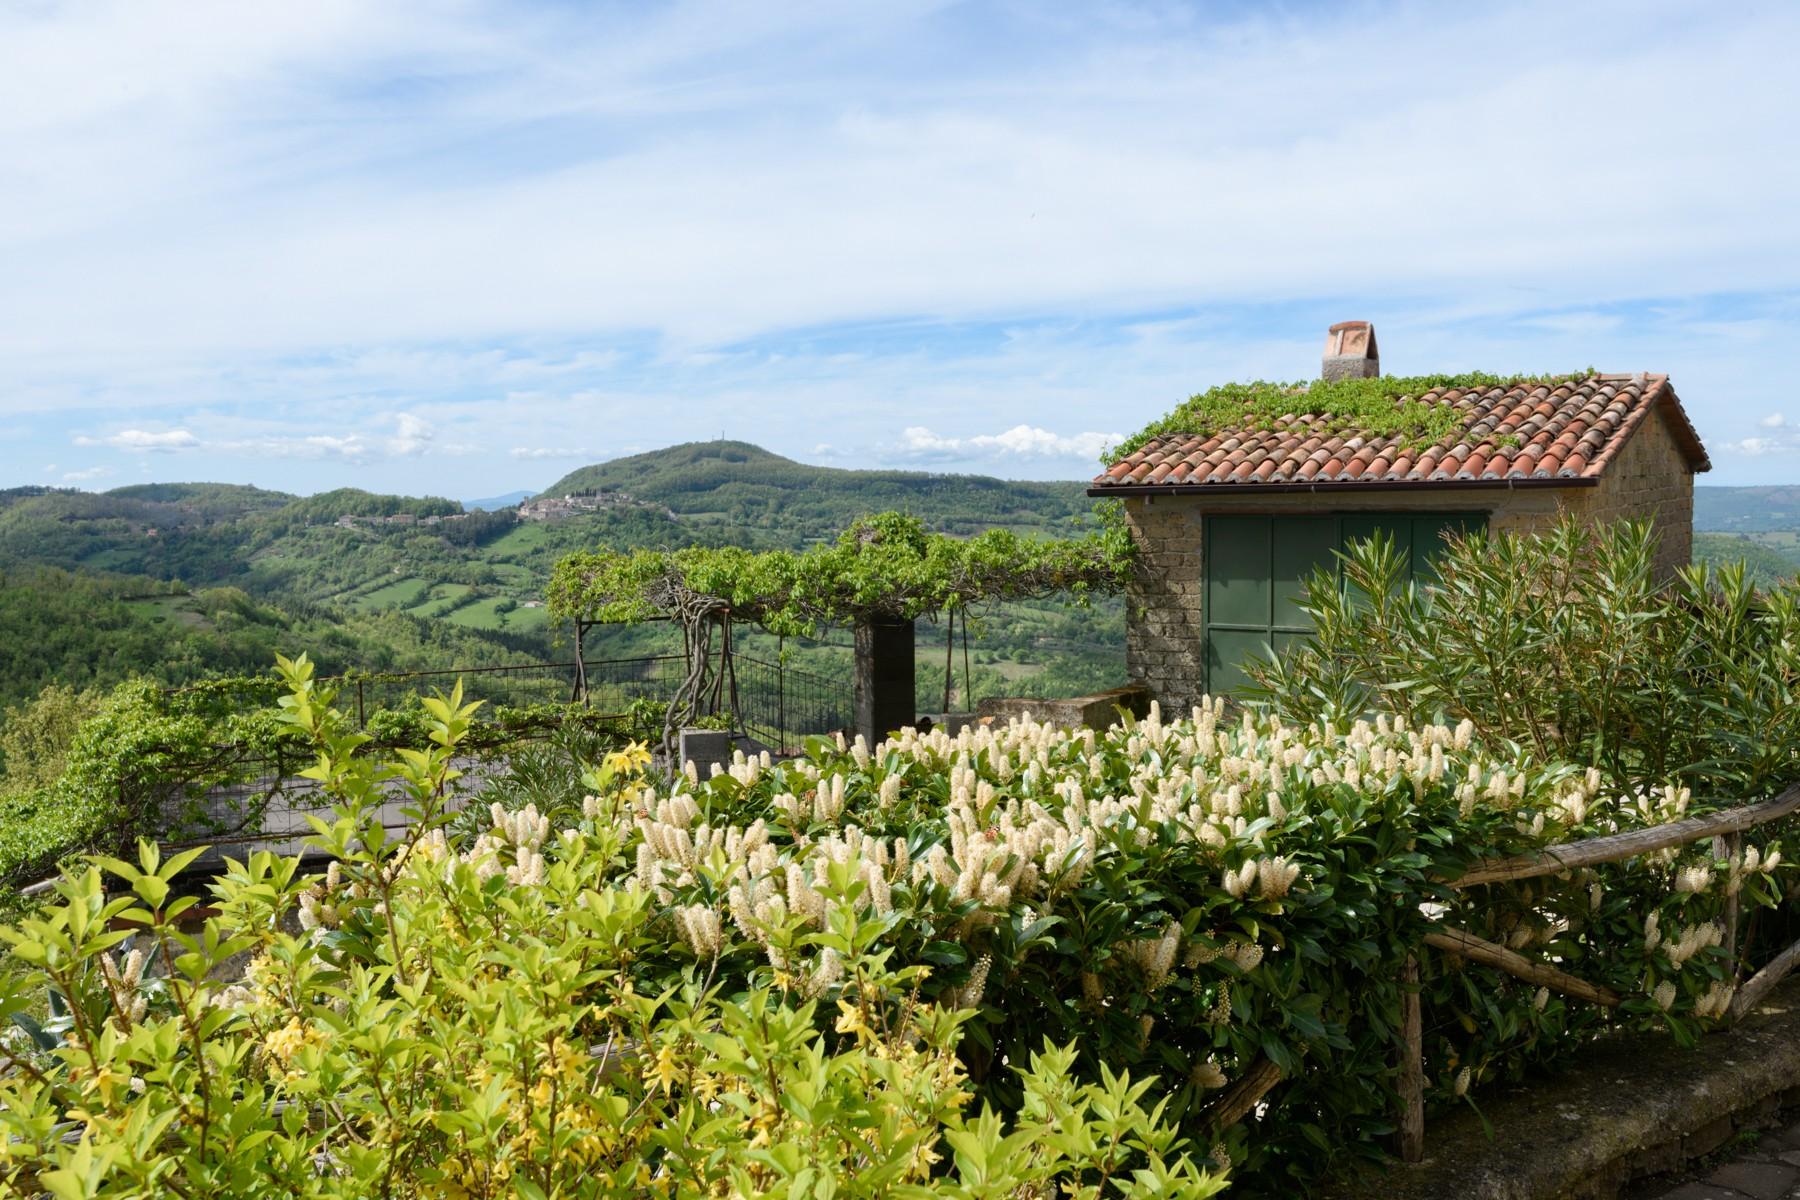 Casa indipendente in Vendita a Semproniano: 4 locali, 220 mq - Foto 3